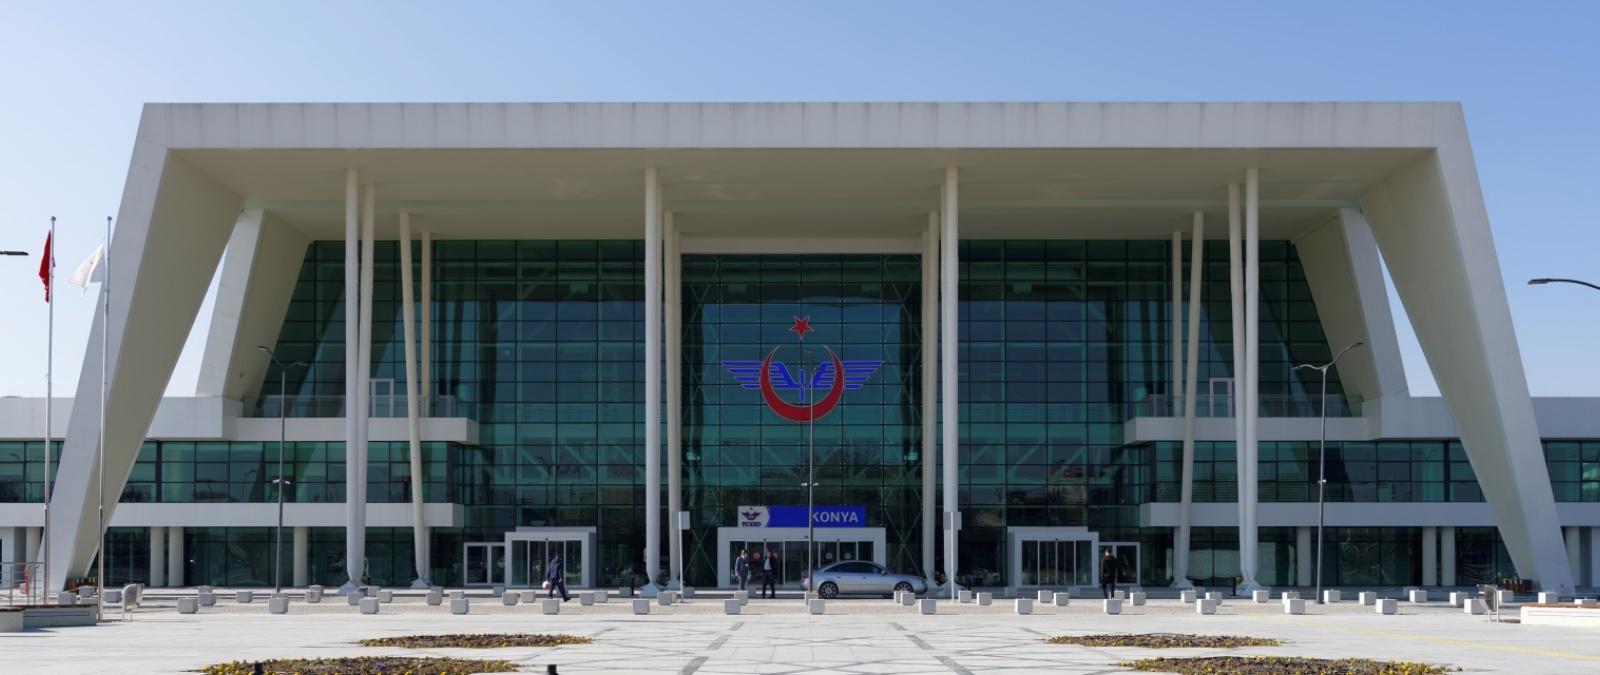 Konya Selcuklu HST station